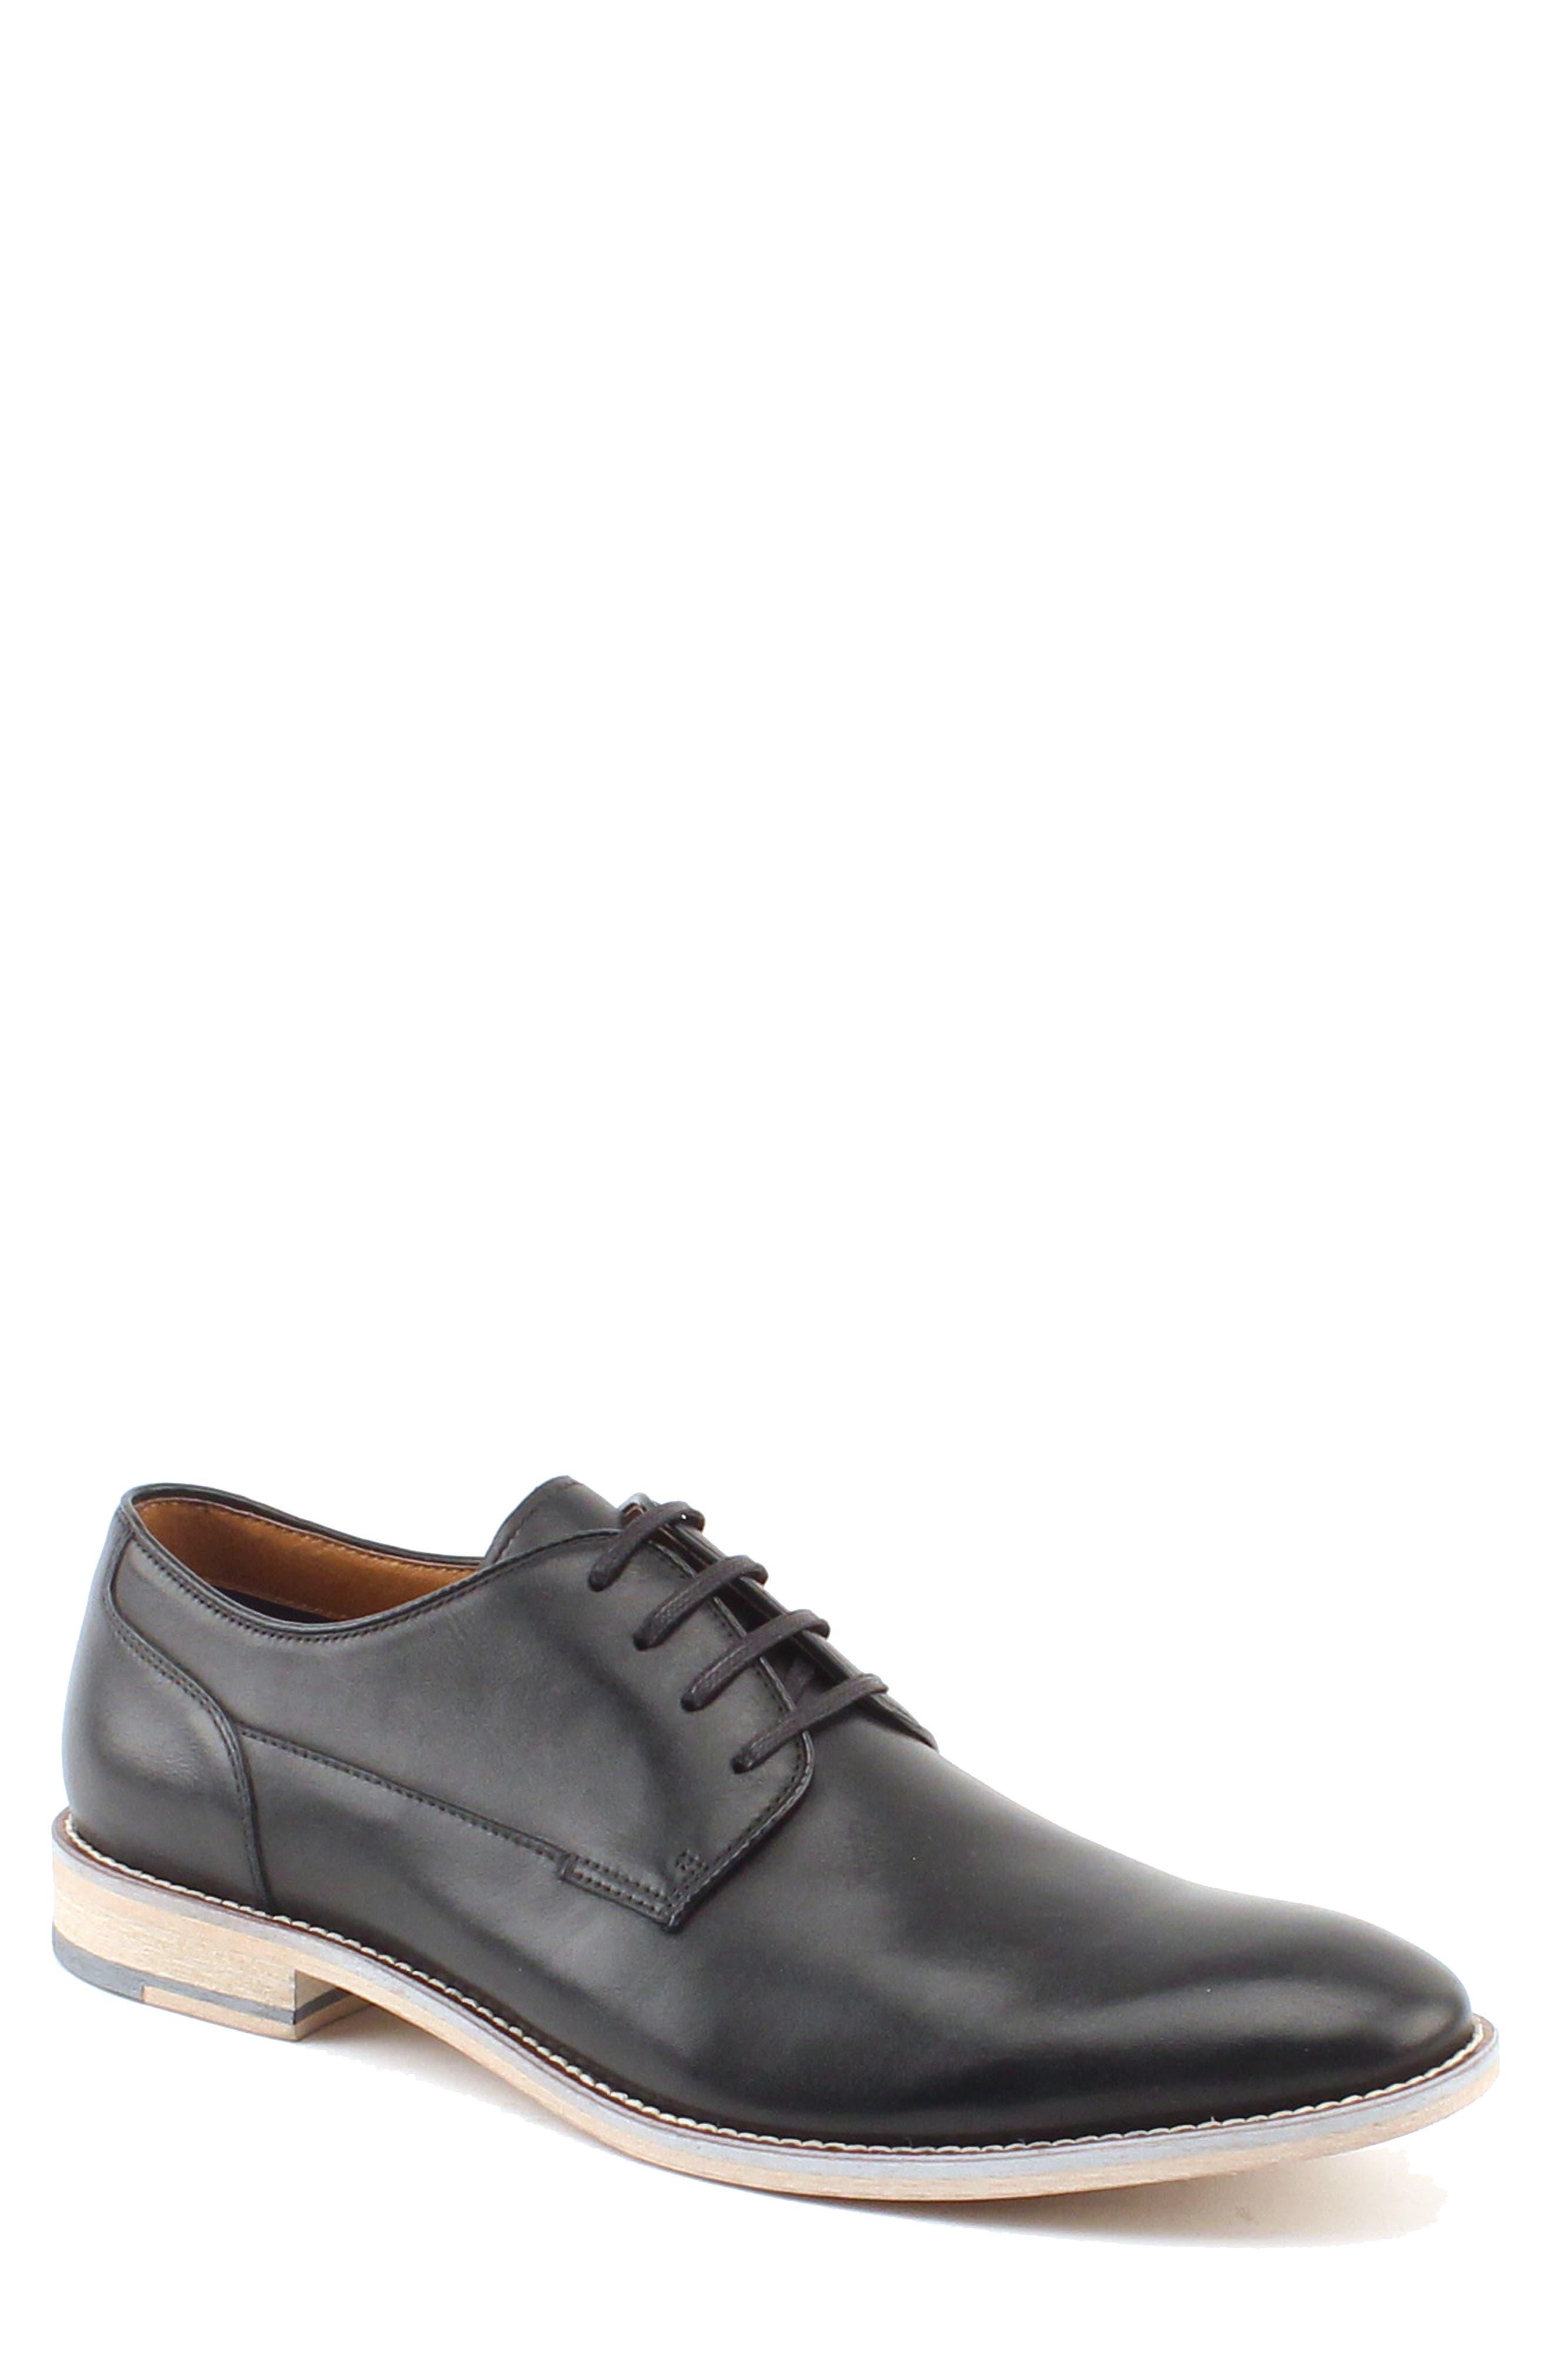 RUSH BY GORDON RUSH Kieren Plain Toe Derby, Main, color, BLACK LEATHER